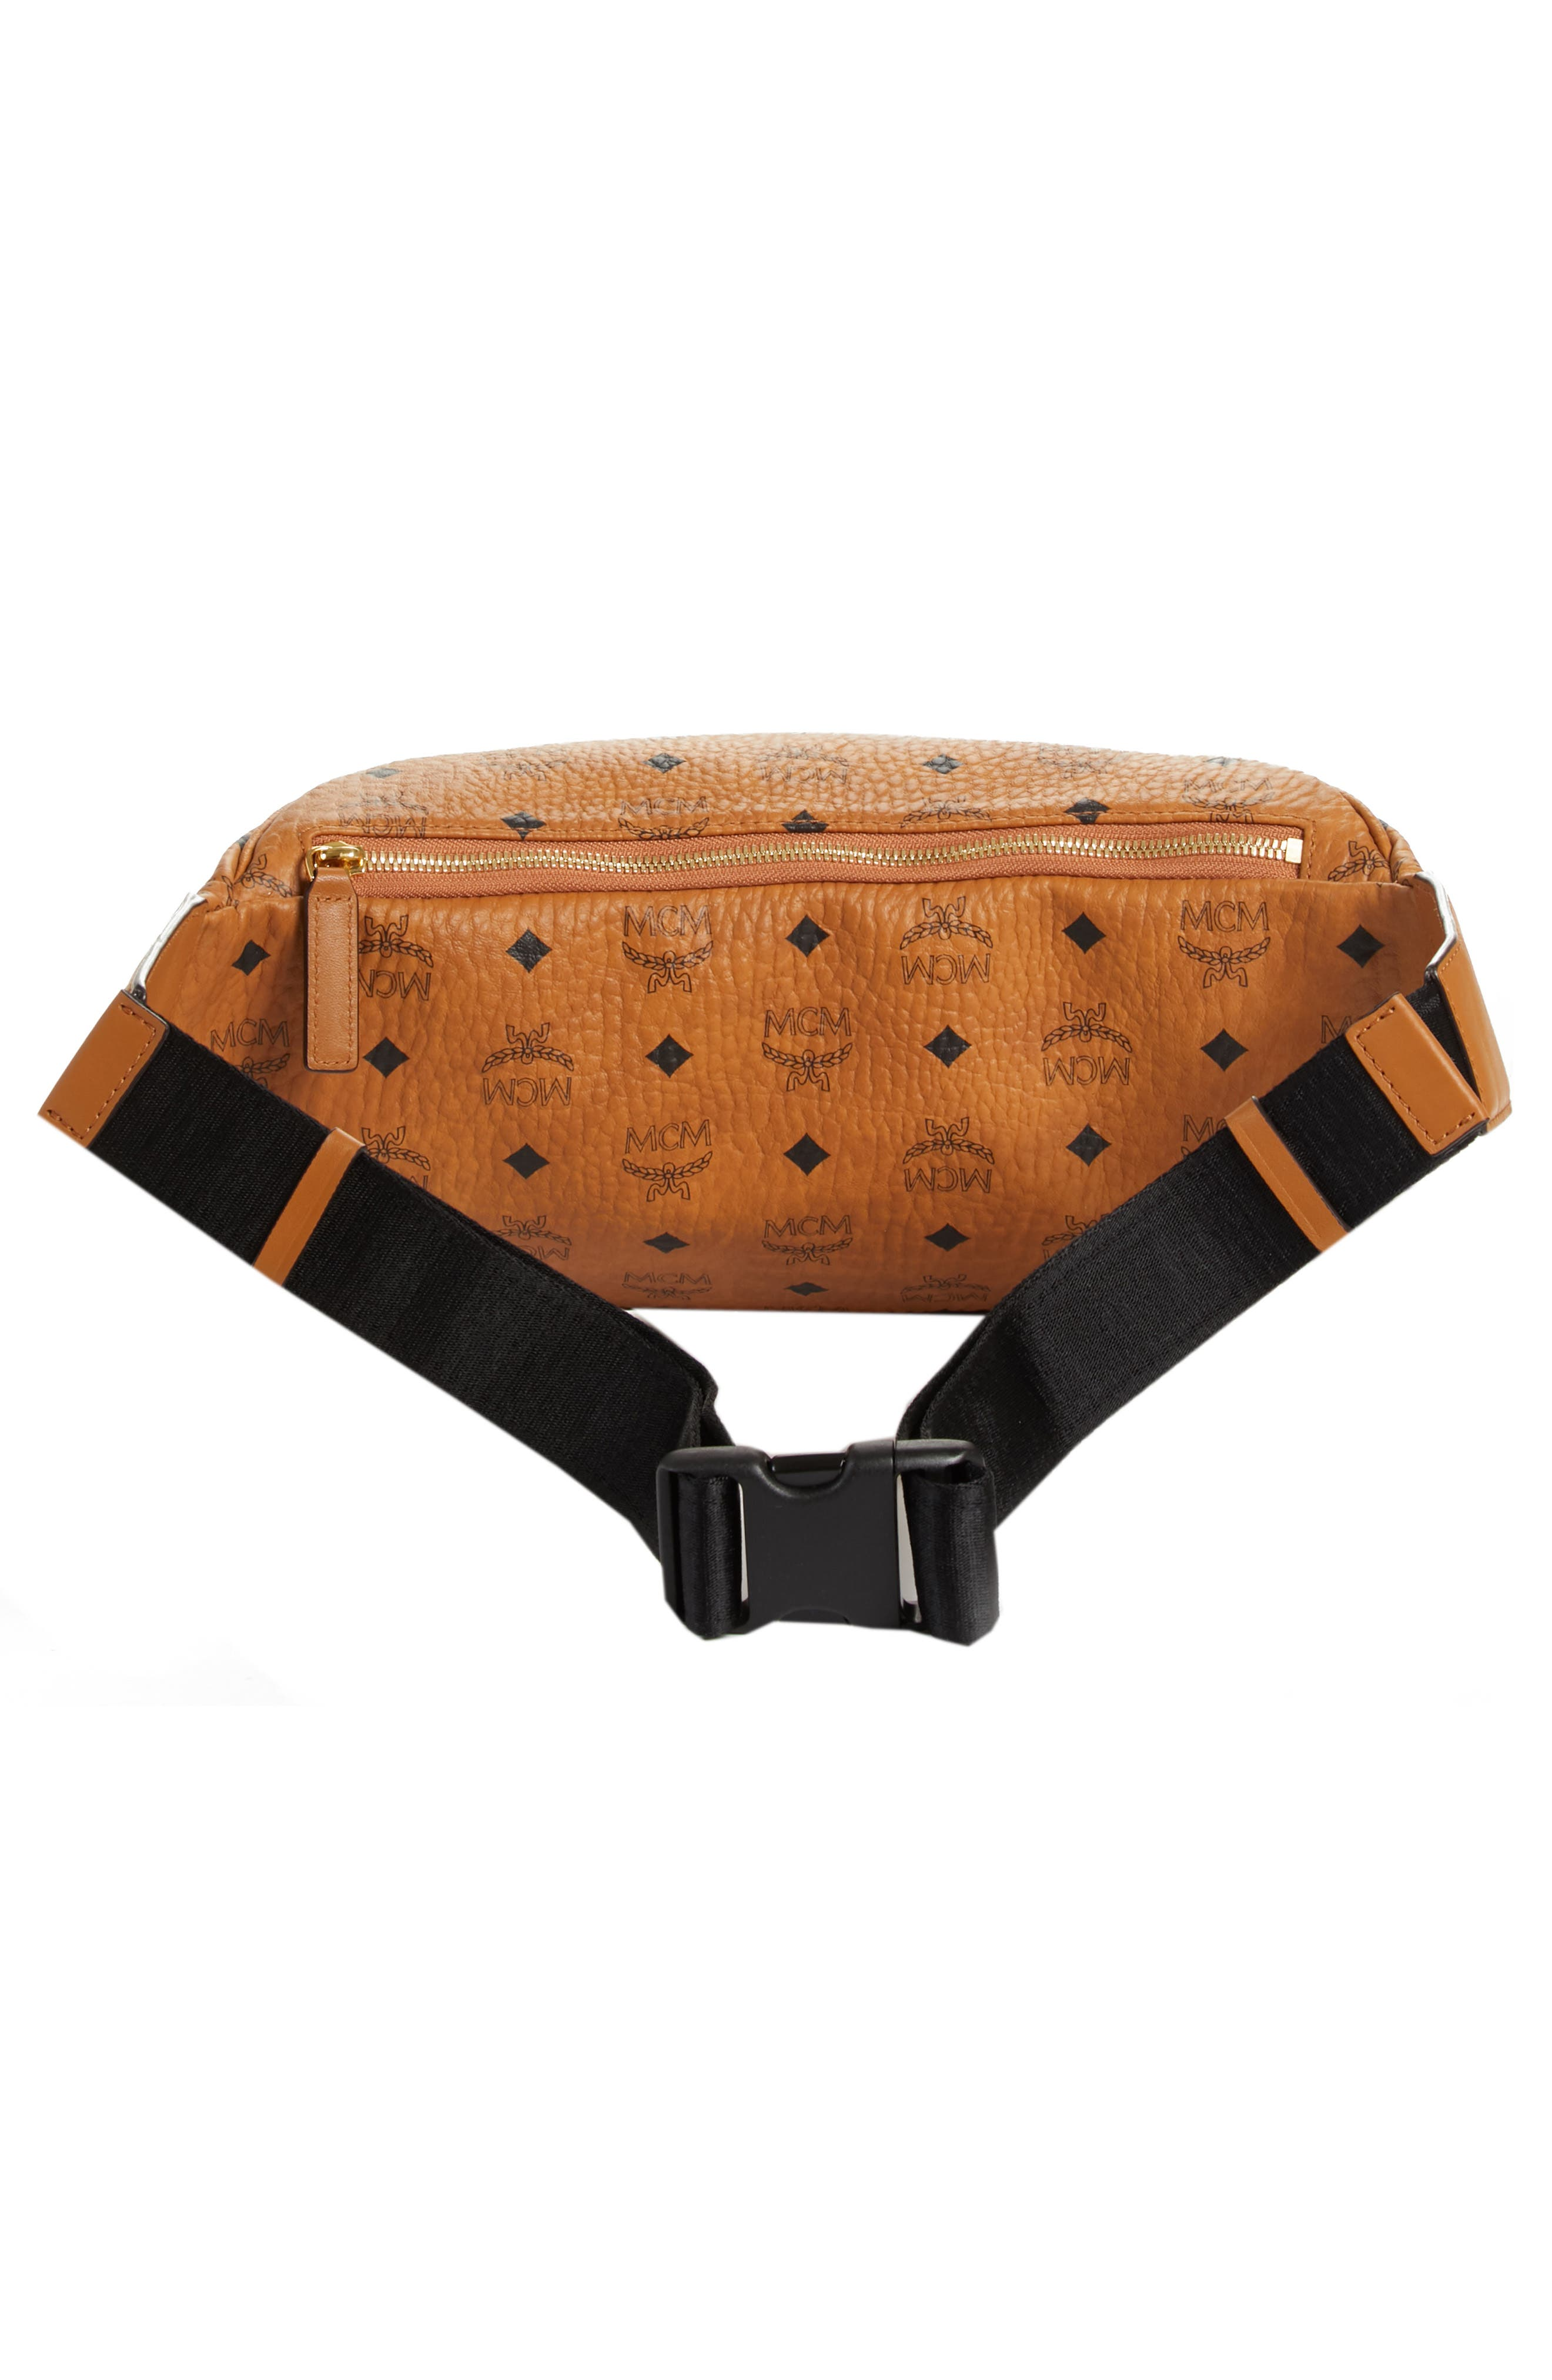 Medium Stark Belt Bag,                             Alternate thumbnail 2, color,                             Cognac Co